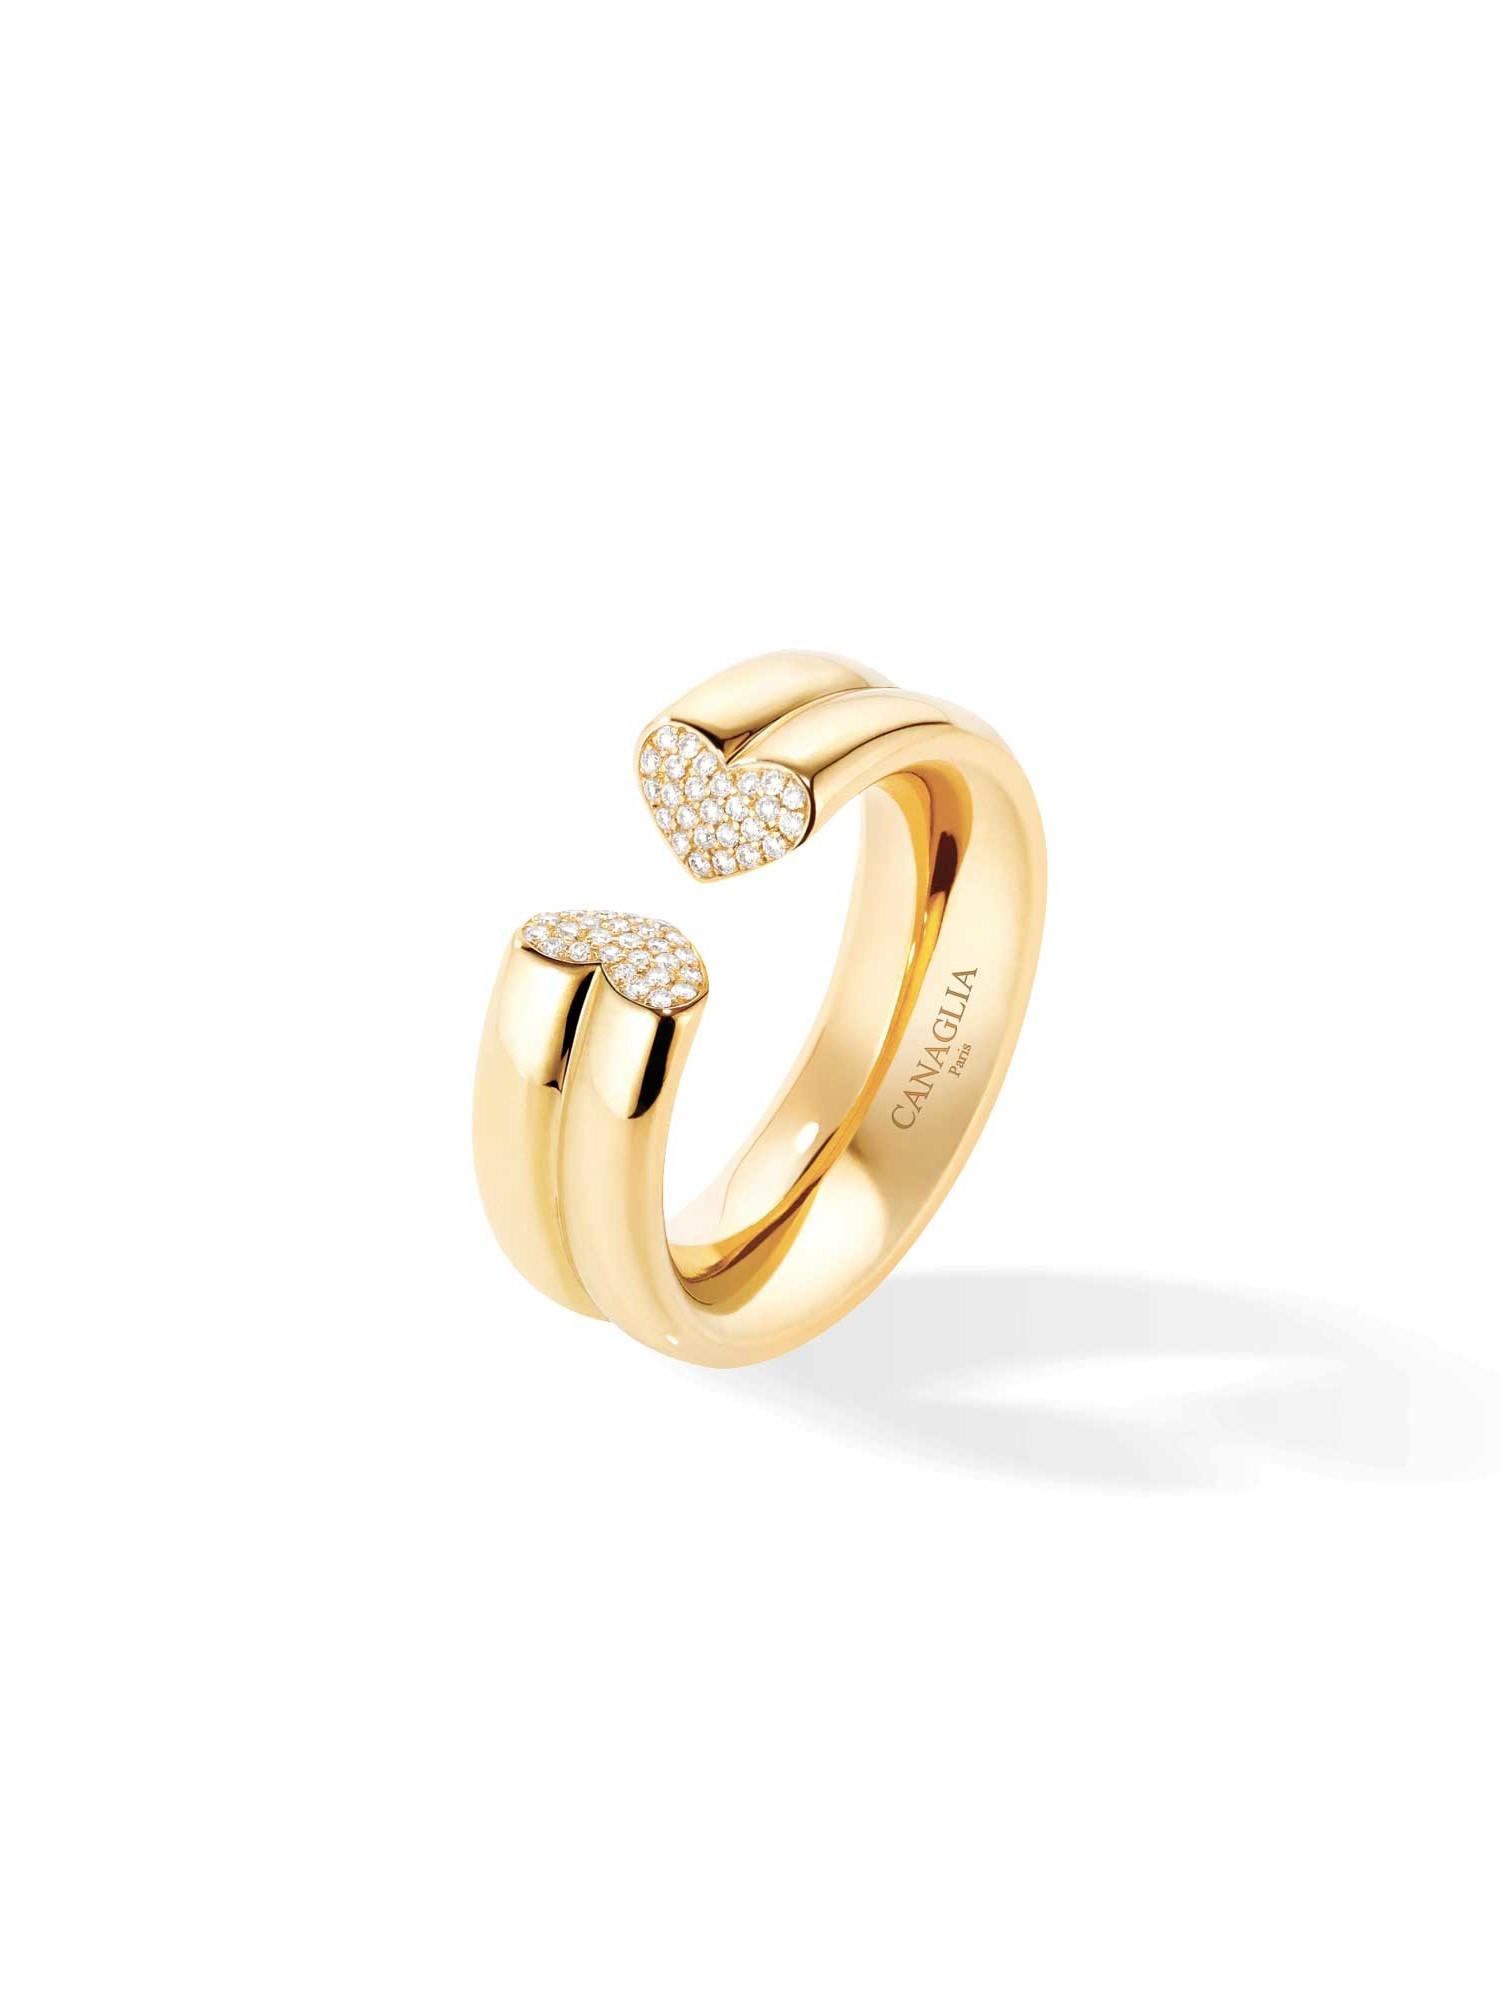 Bague grand coeur or jaune pavage diamants - Joaillerie Canaglia Paris-Milan